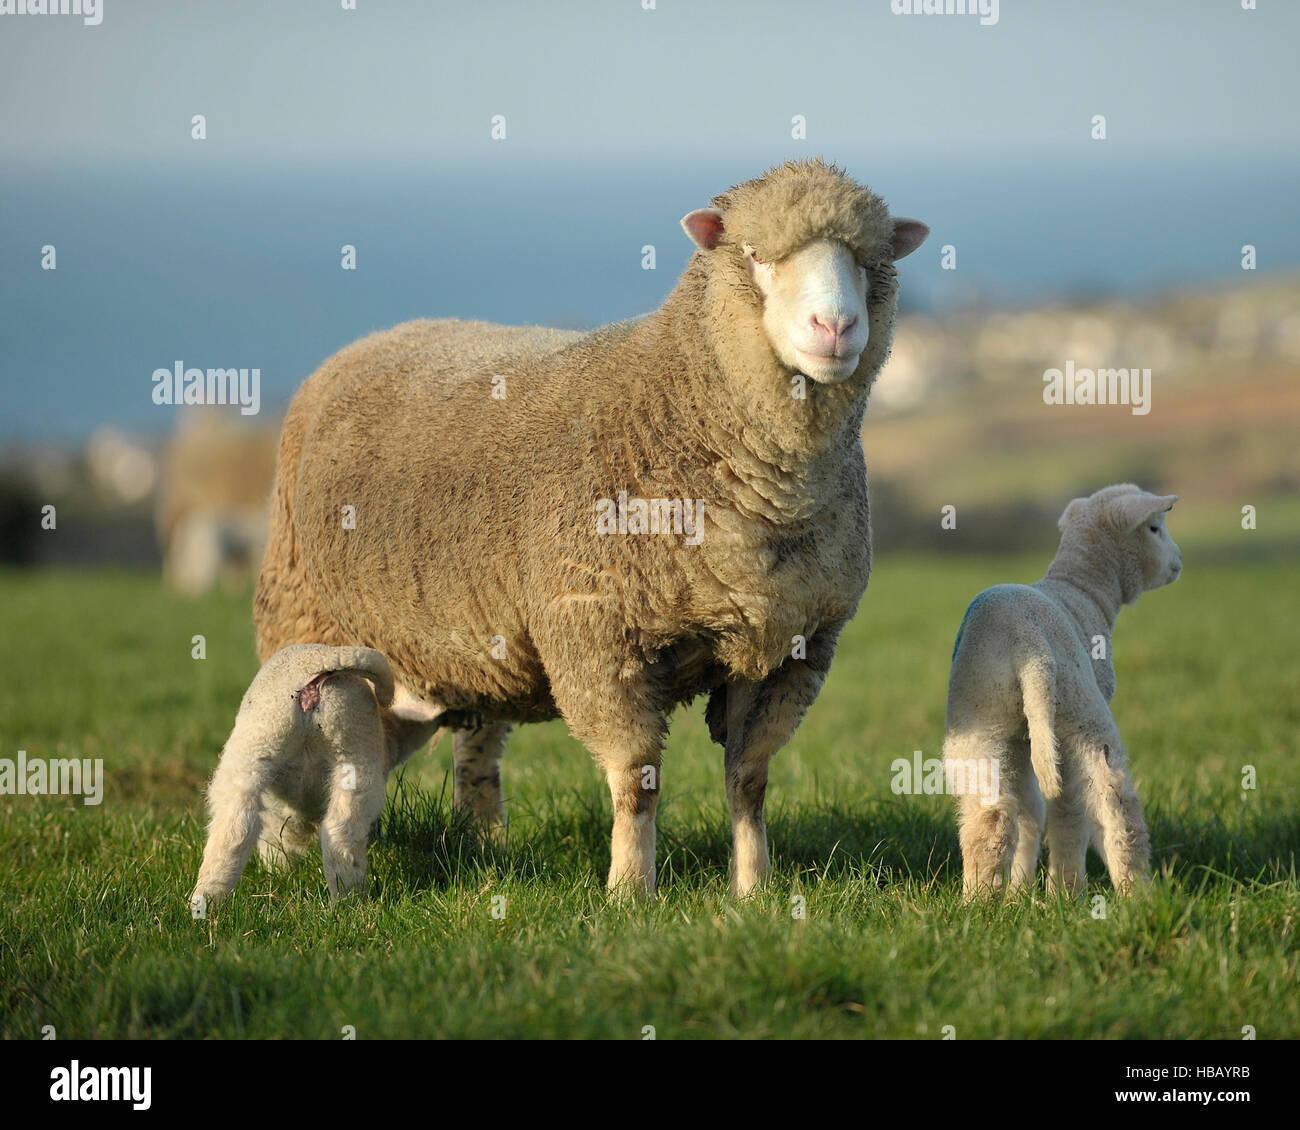 poll dorset ewe and her lambs - Stock Image